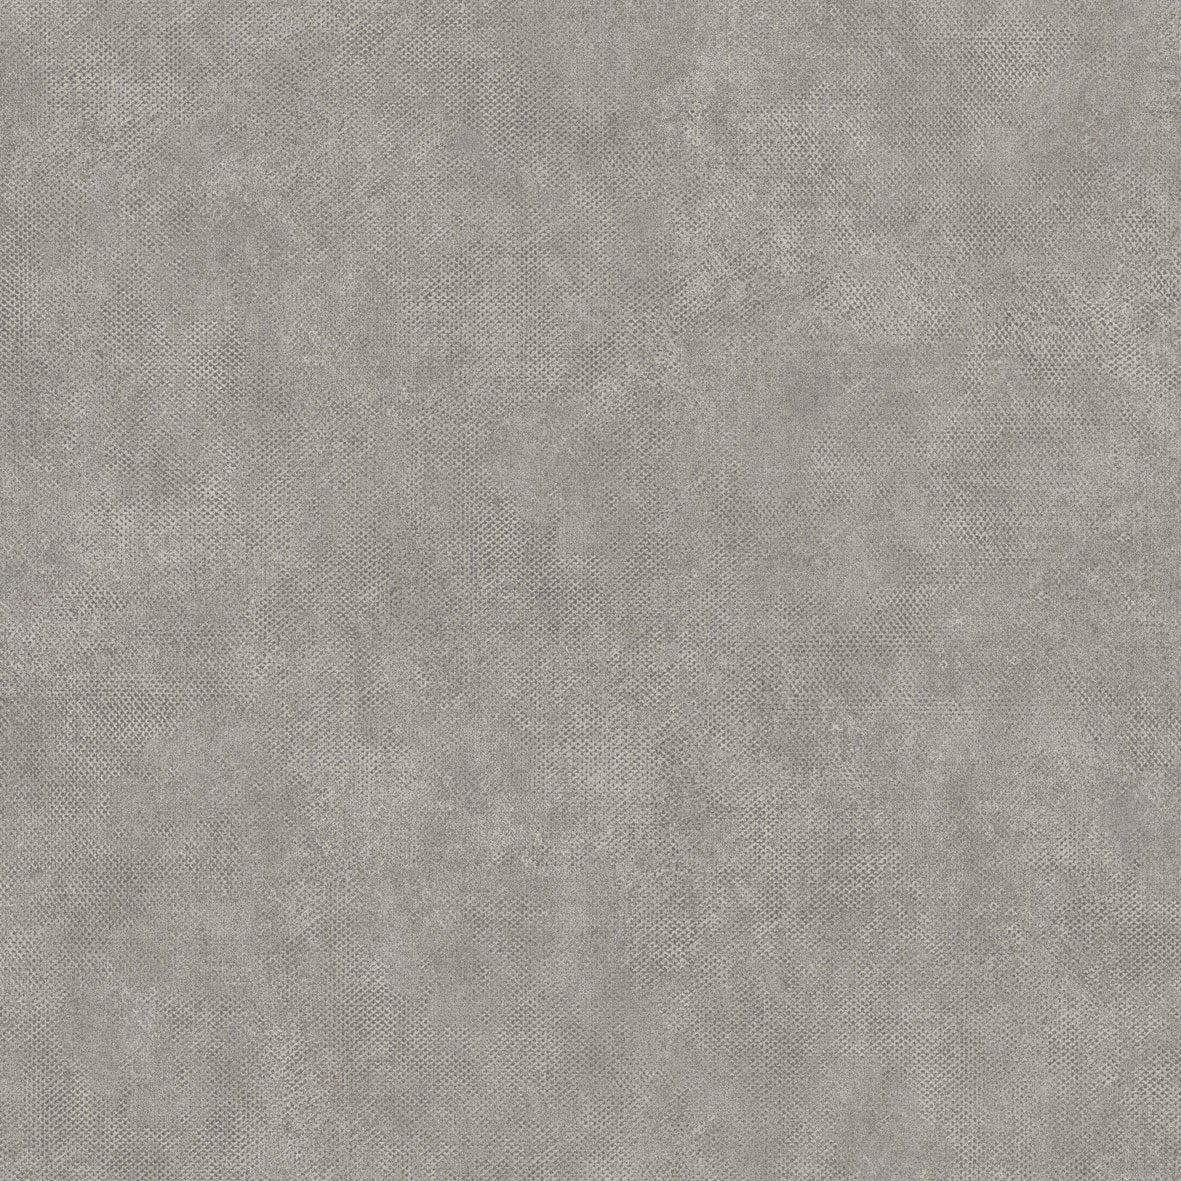 sol pvc gris galet 3 artens declic l 4 m leroy merlin. Black Bedroom Furniture Sets. Home Design Ideas